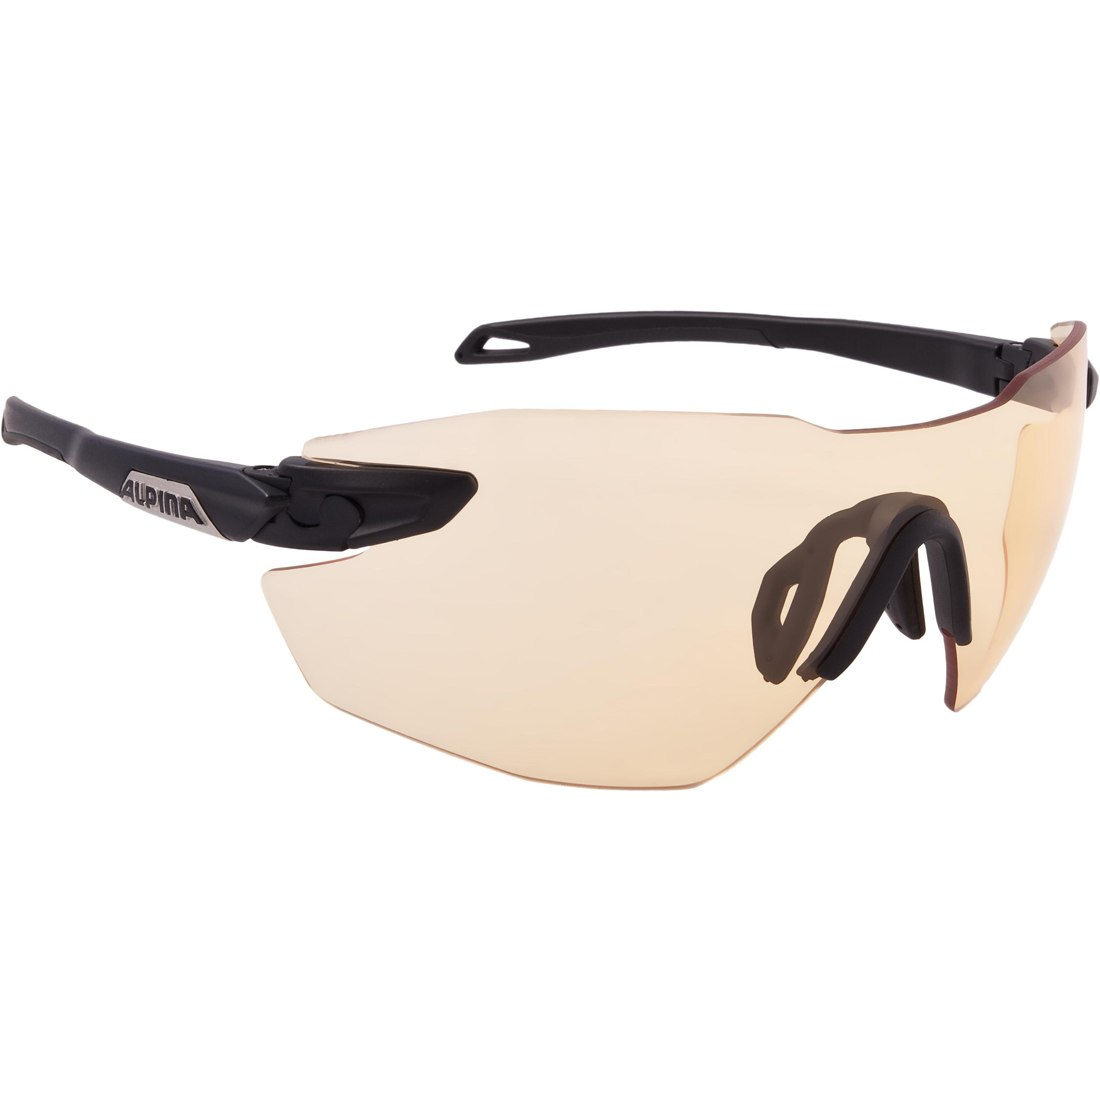 Image of Alpina Twist Five Shield RL VL+ black matt/Varioflex orange - Glasses